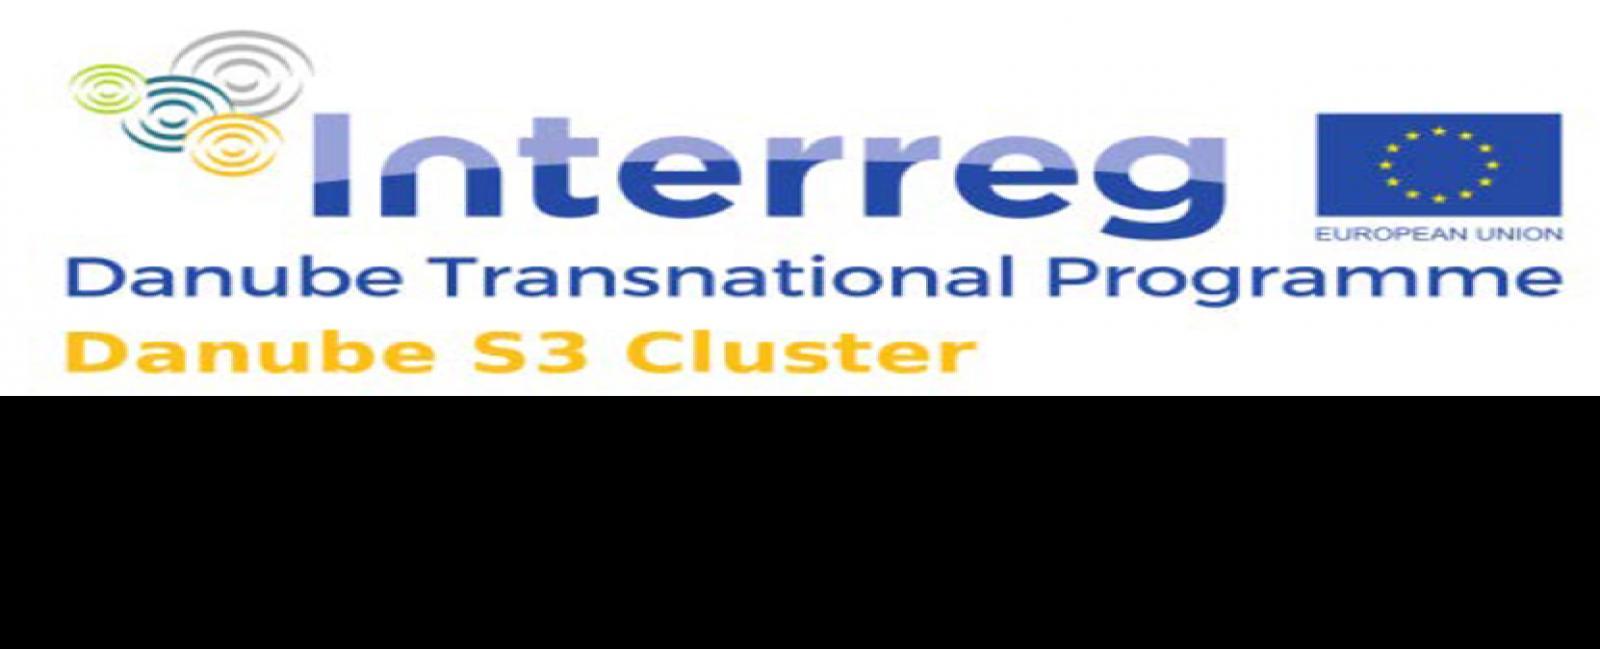 antet-danube-s3-cluster_0.jpg